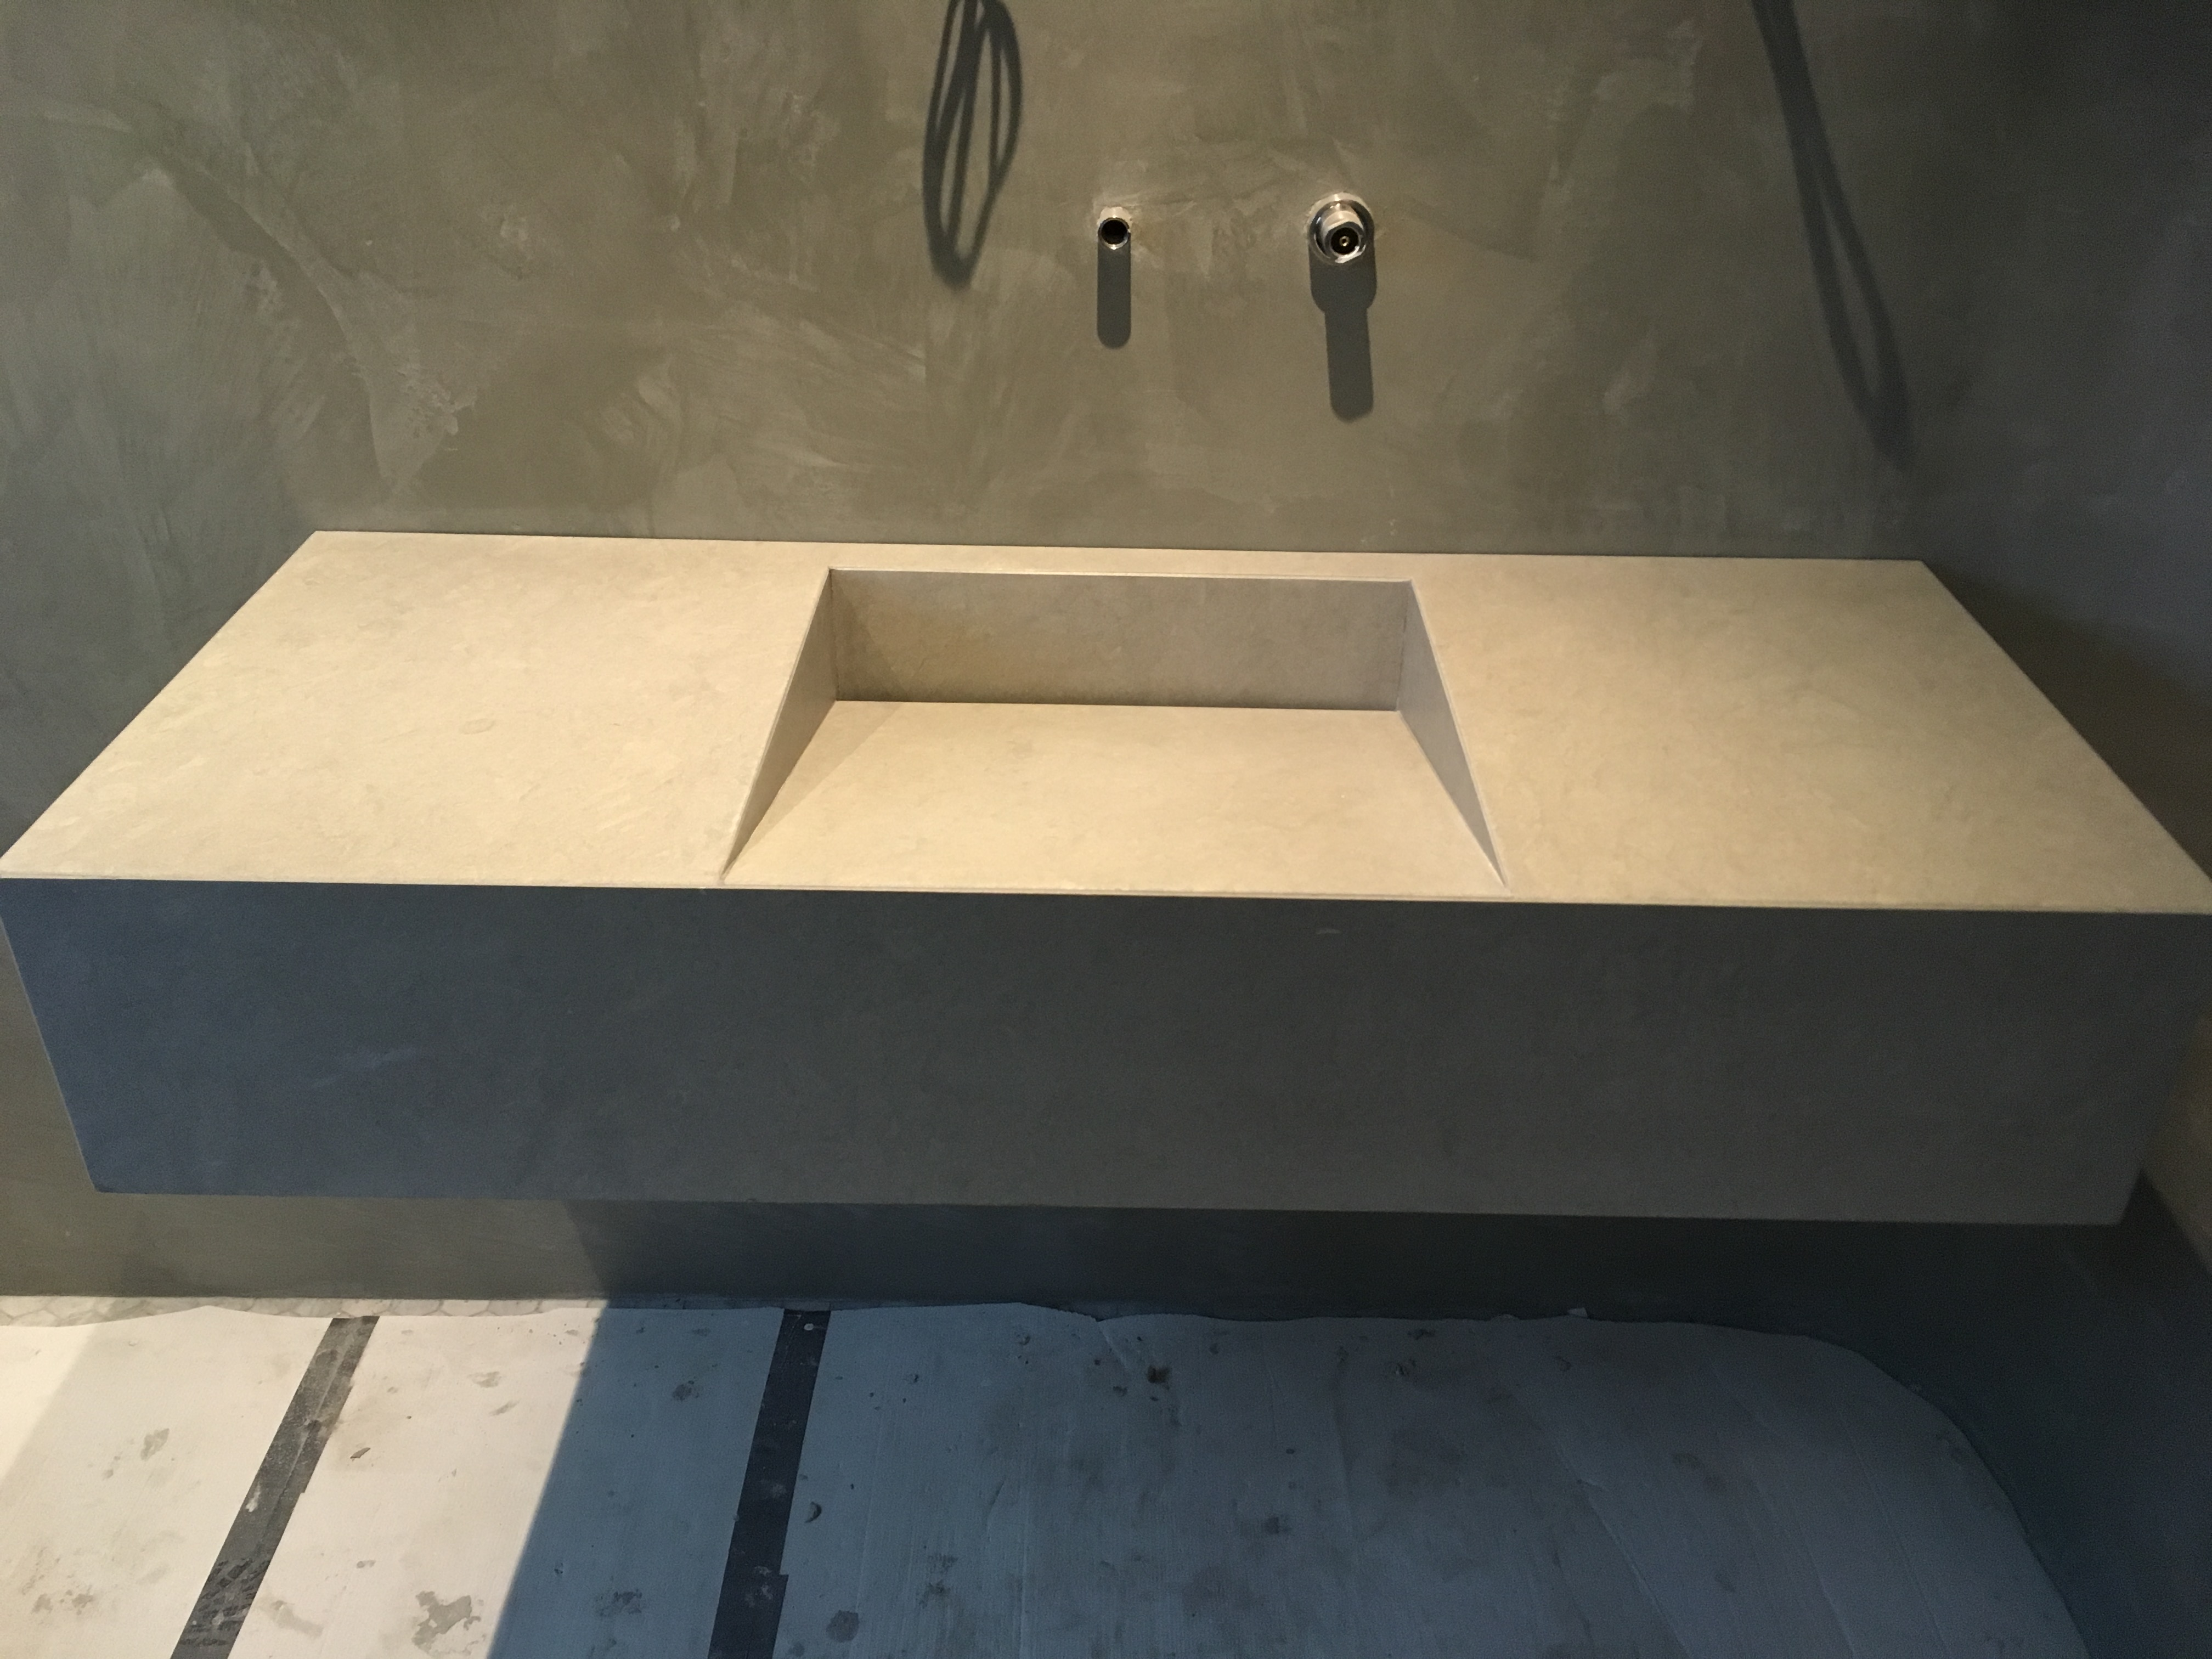 Bateig blue bathroom bespoke vanity shallow gap waste